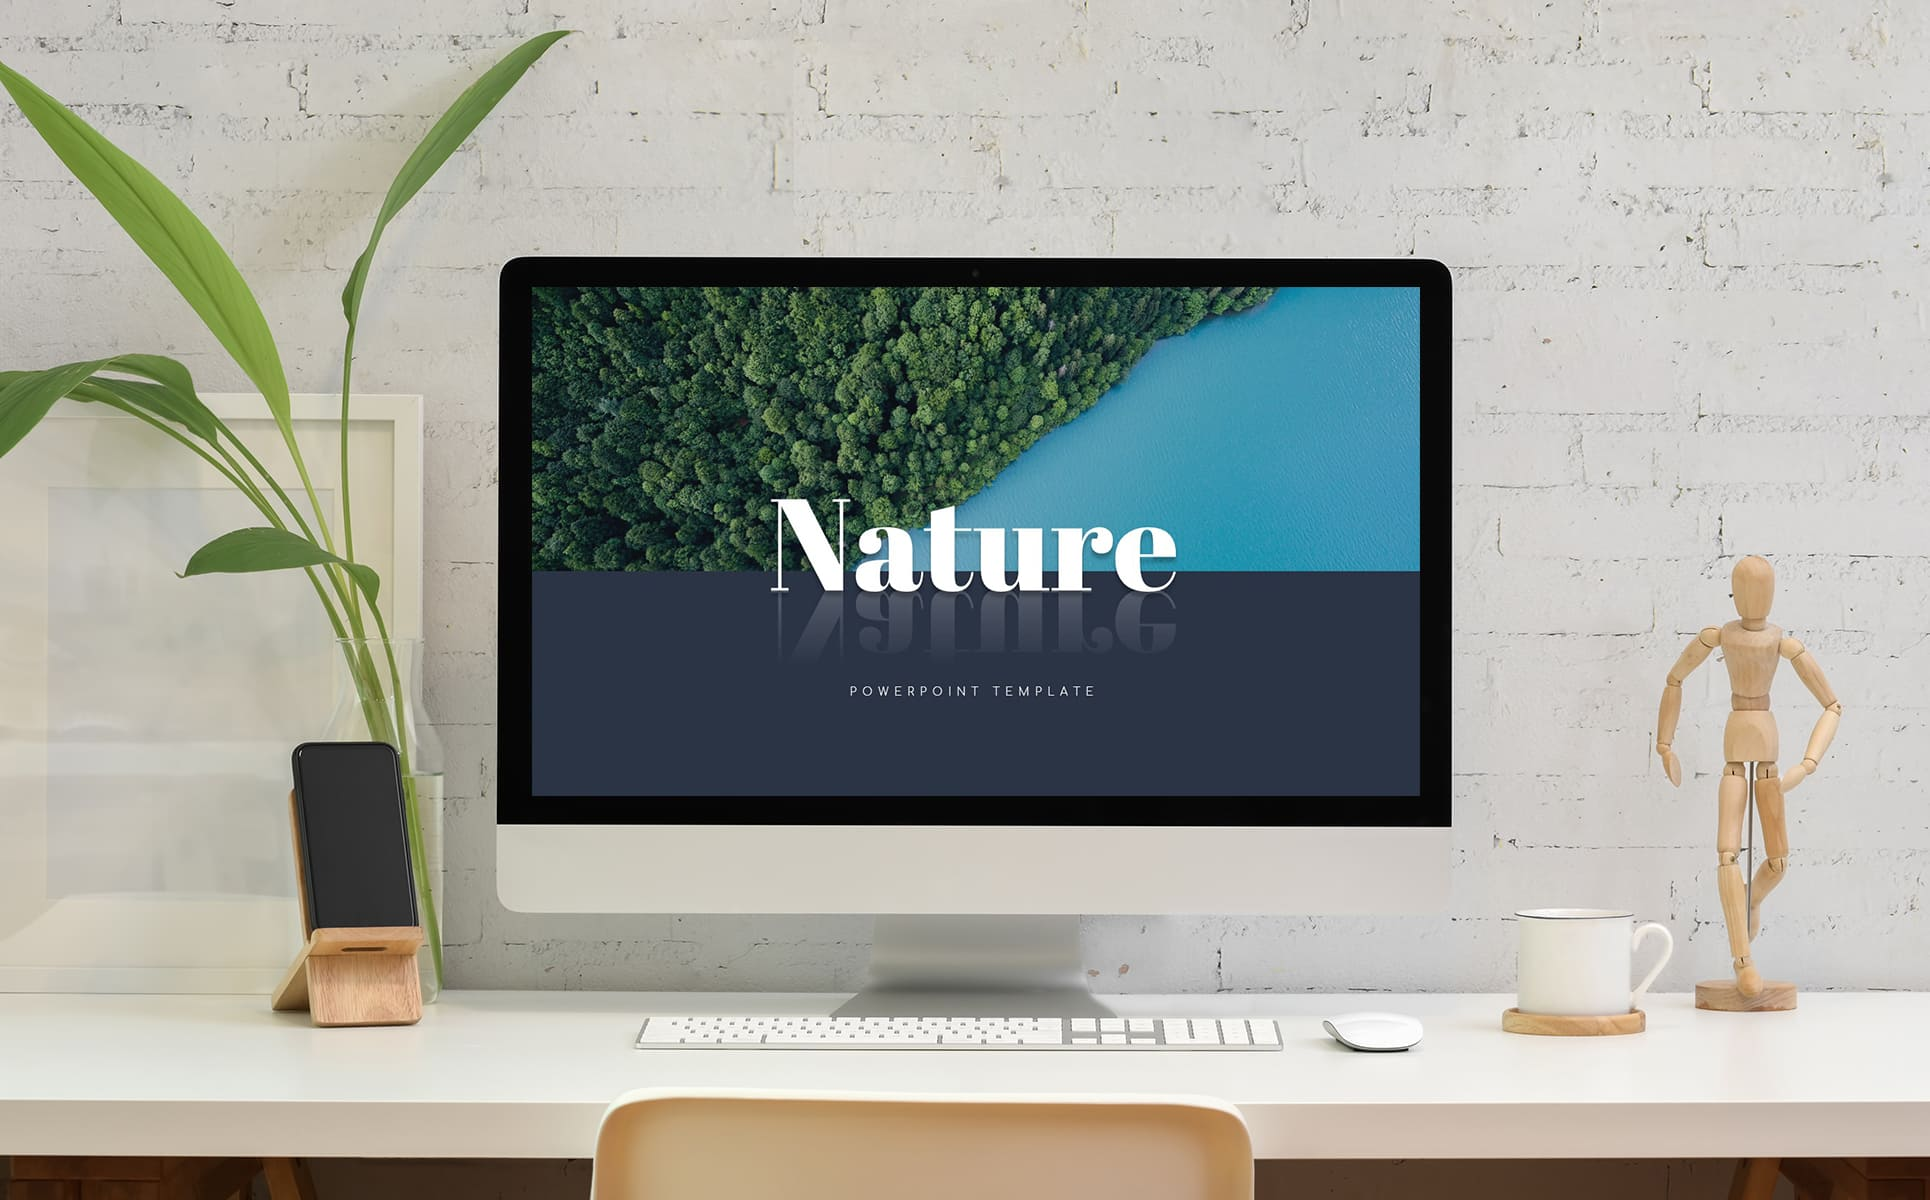 Nature Presentation Template by MasterBundles Desktop preview mockup image.